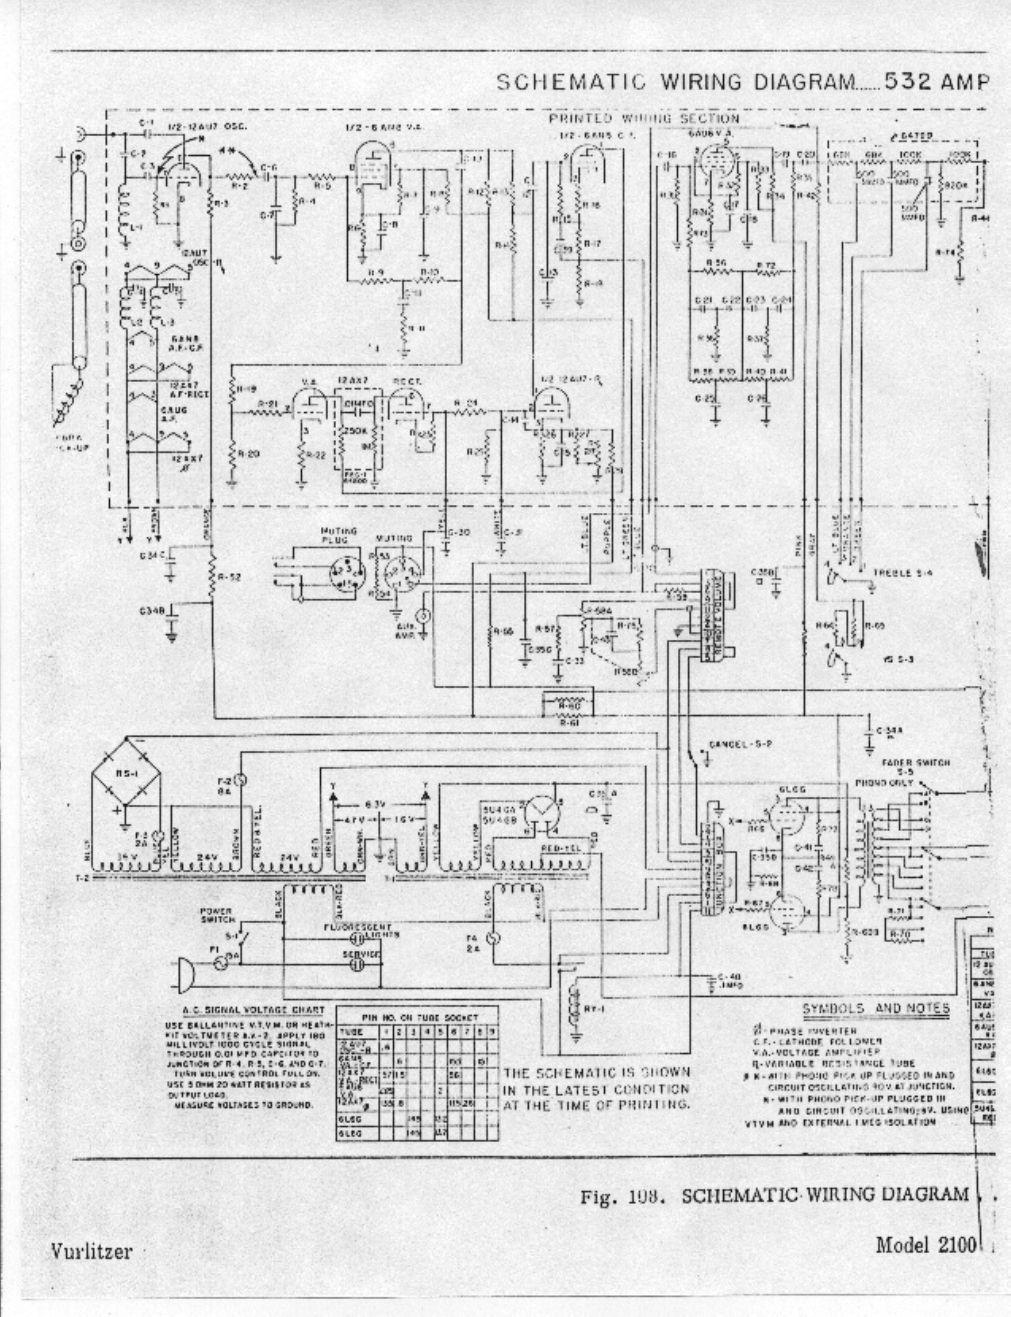 From Cshaines At Verizonnet Sat Jun 1 190806 2013 Amplifier Circuit Tubeamplifier Audiocircuit Diagram 532a